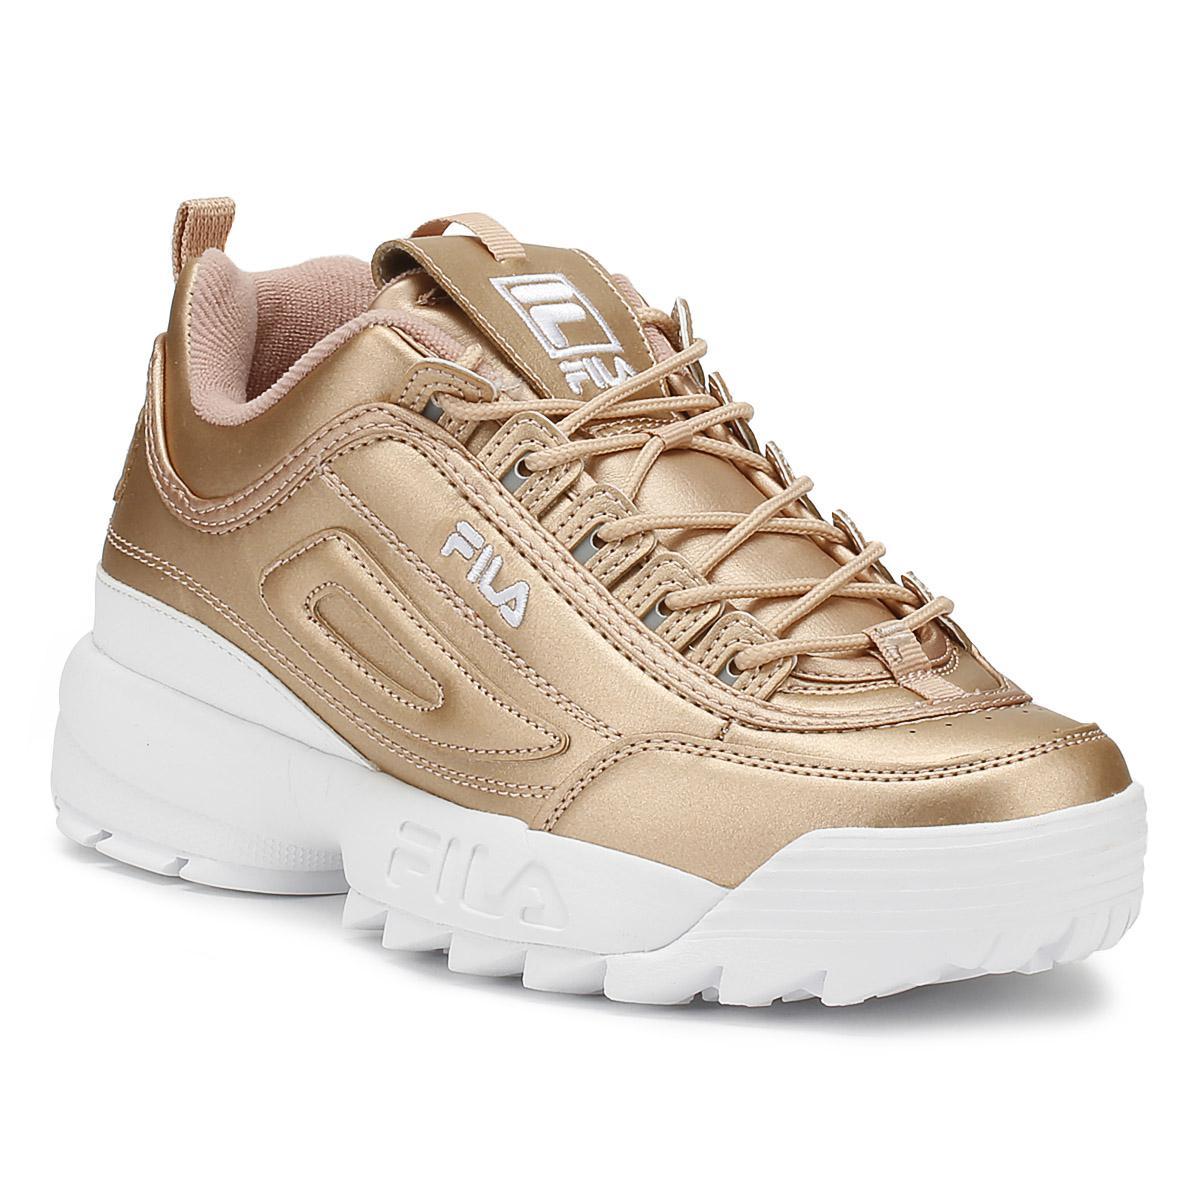 Fila Disruptor Ii Womens Metallic Rose Gold Premium Trainers